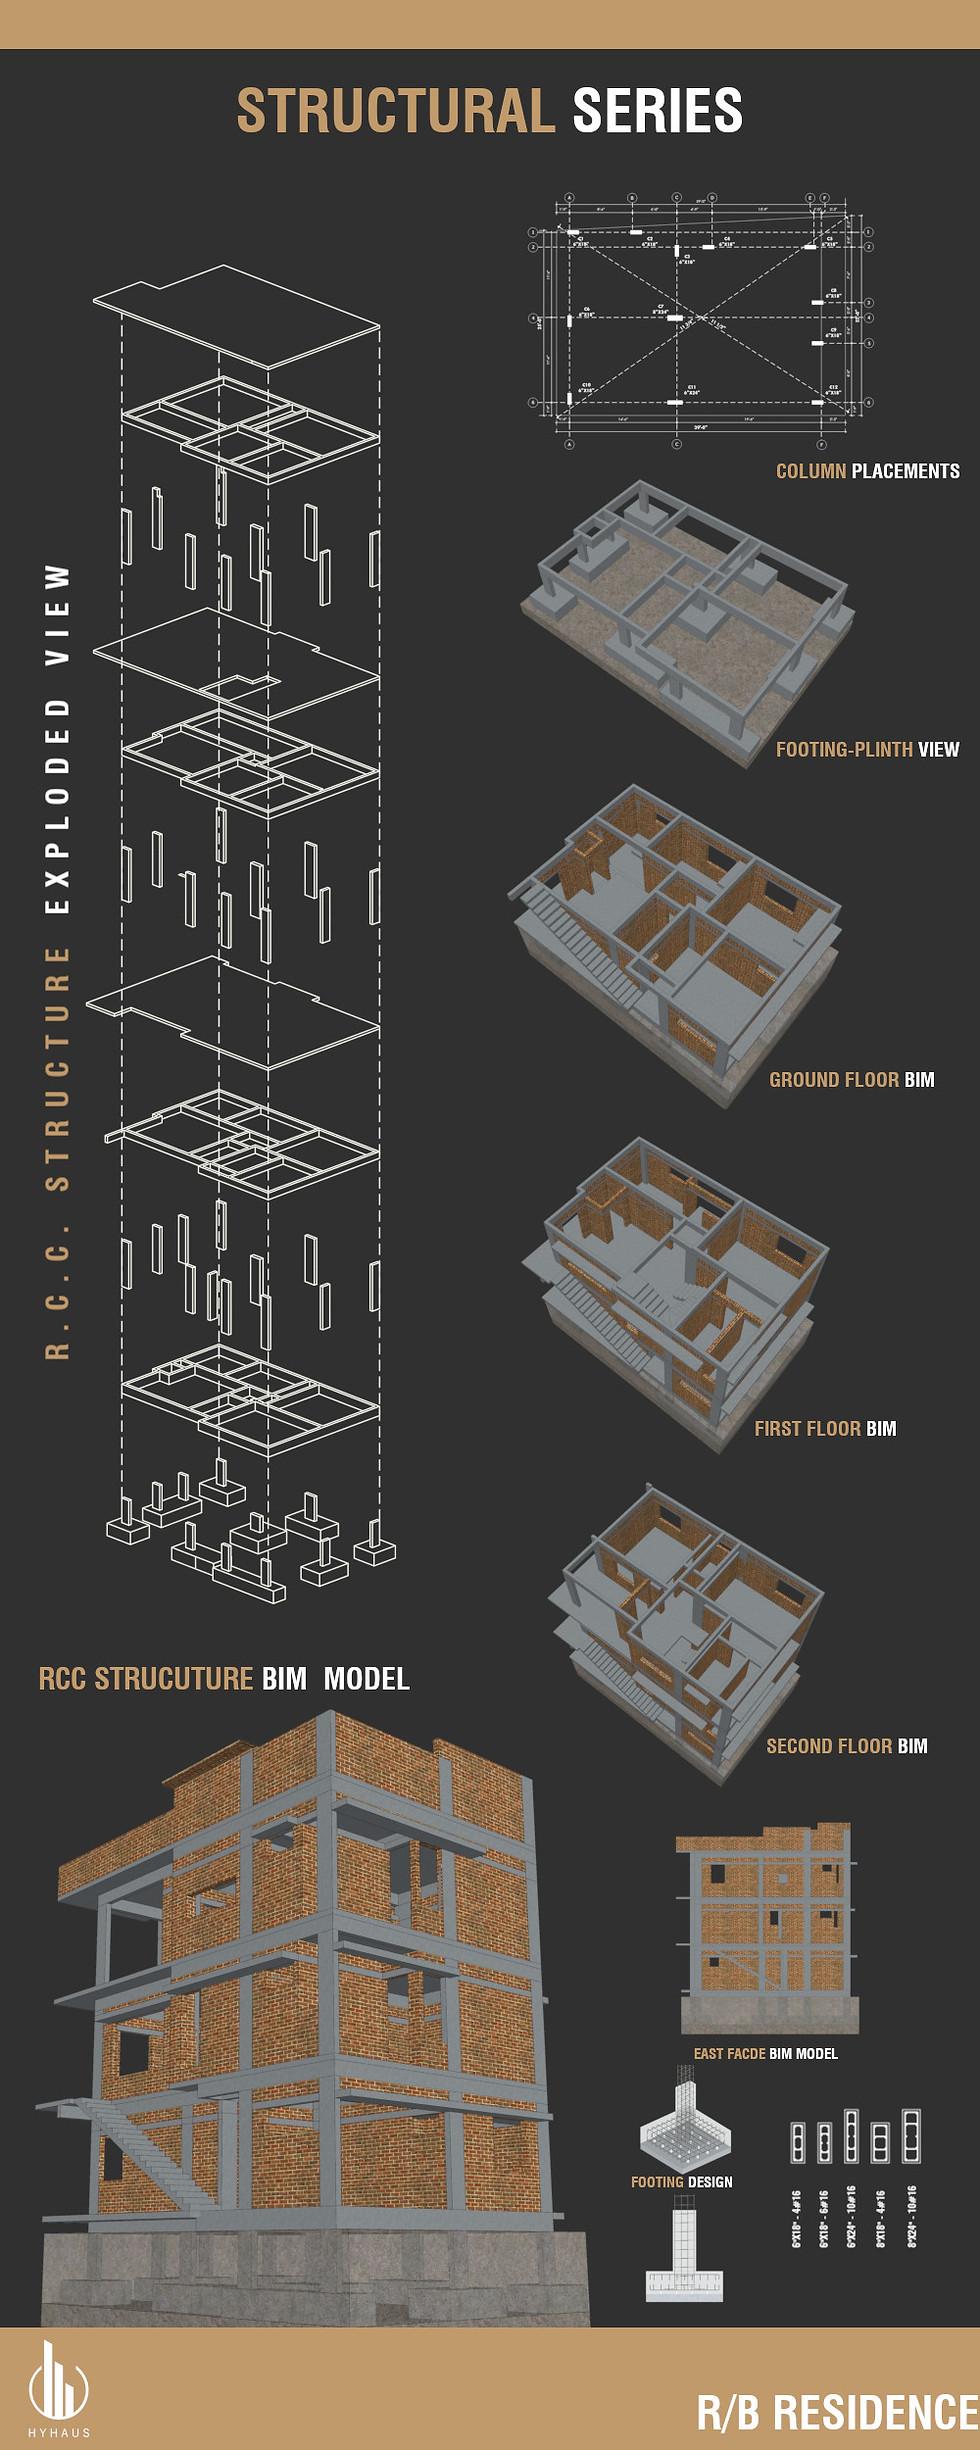 structural series ramesh.jpg